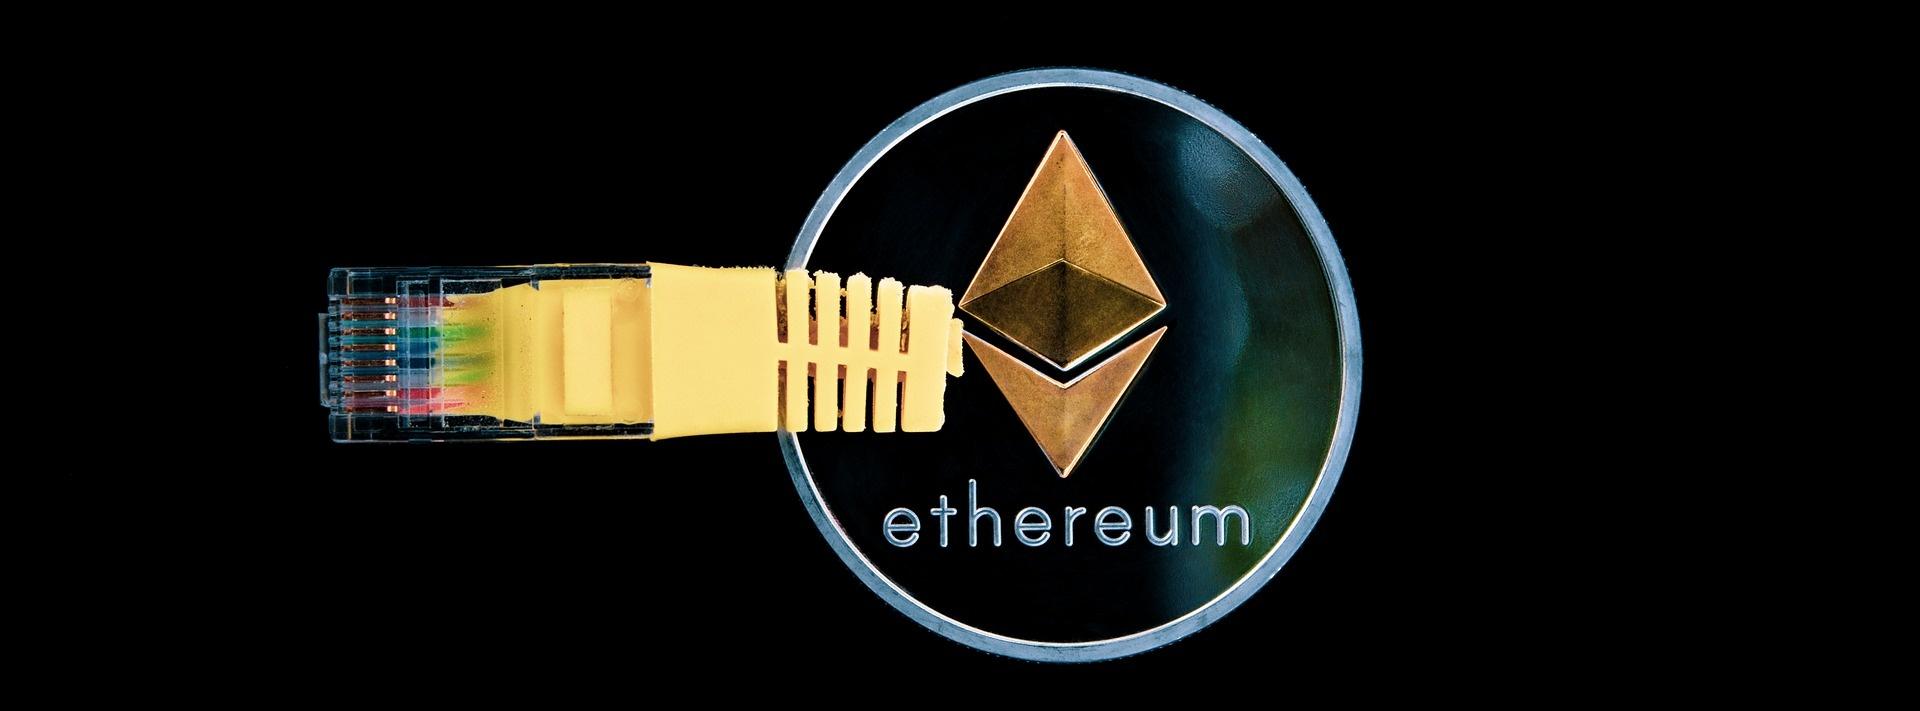 Ethereum Kurs Prognose ETH Münze an LAN Kabel